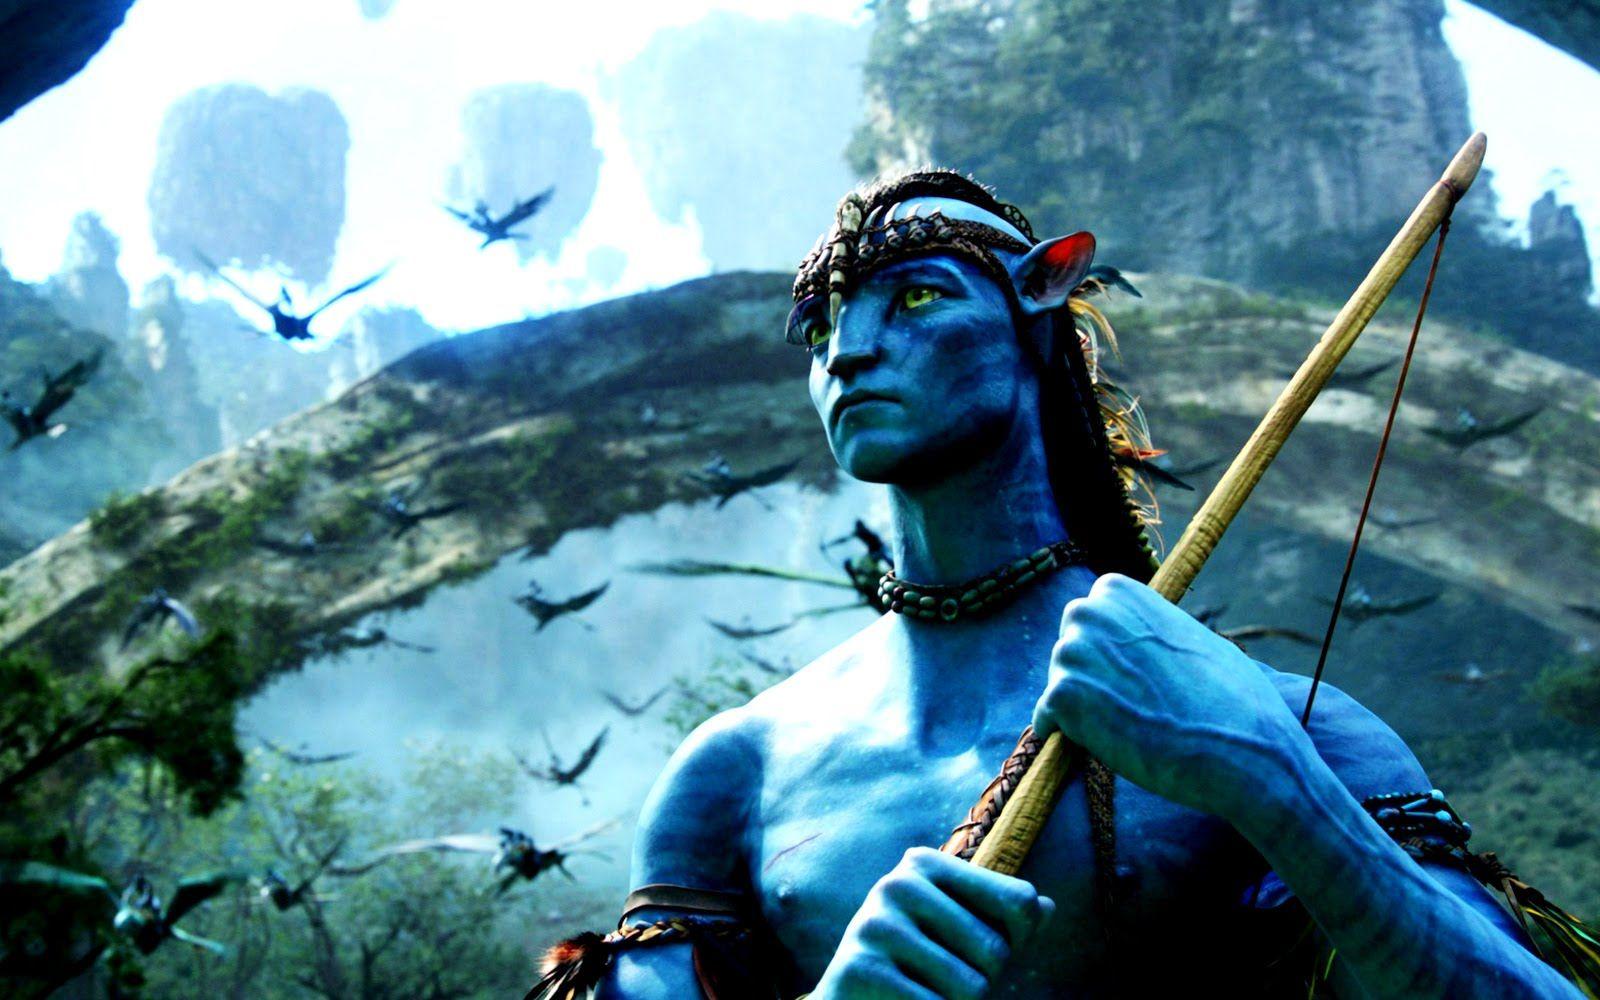 avatar hd movies 1080p full length english movies - adventure movies